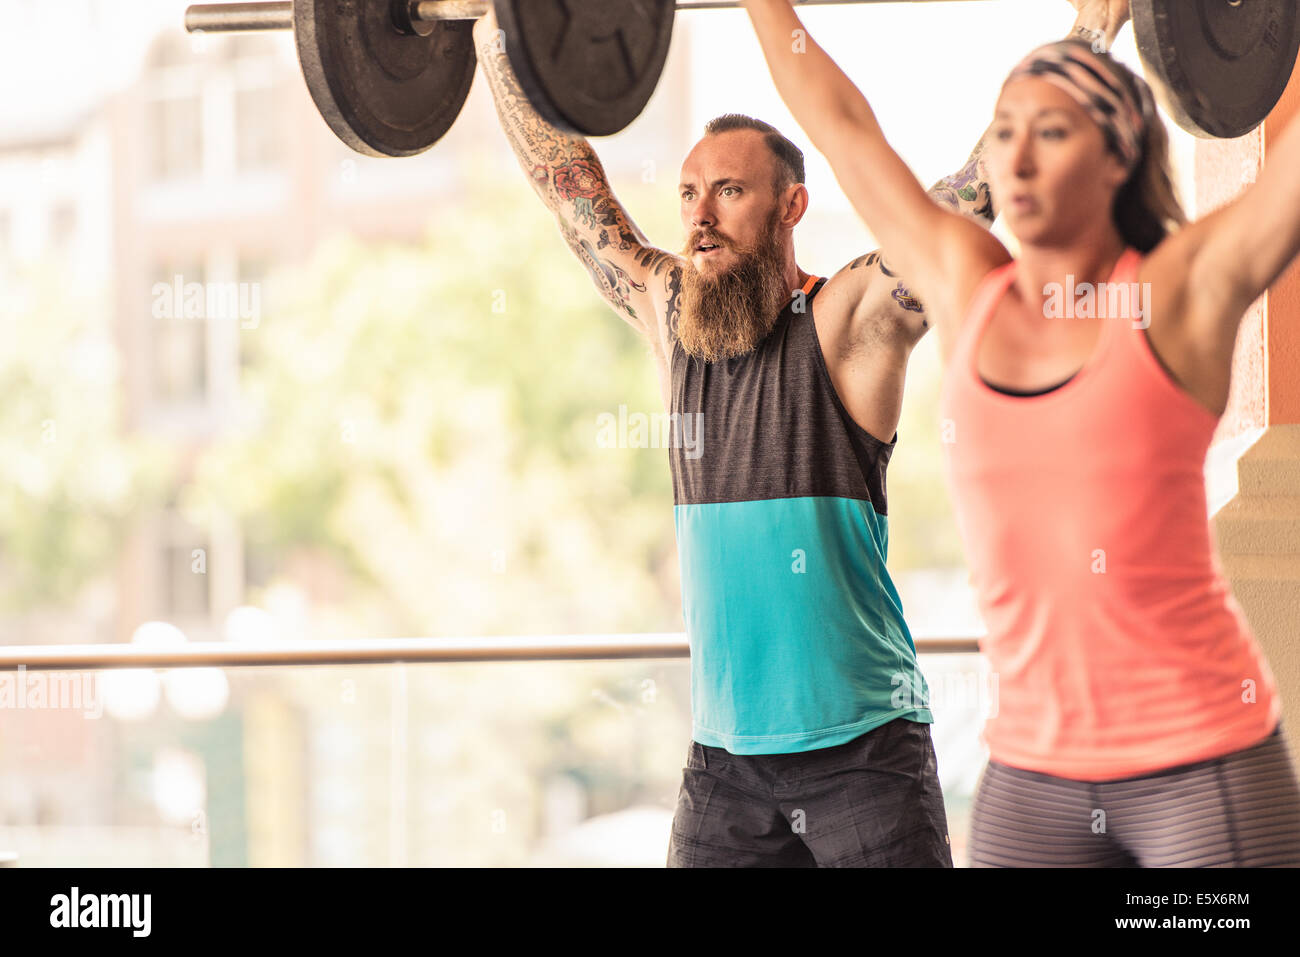 Man and woman lifting weights - Stock Image